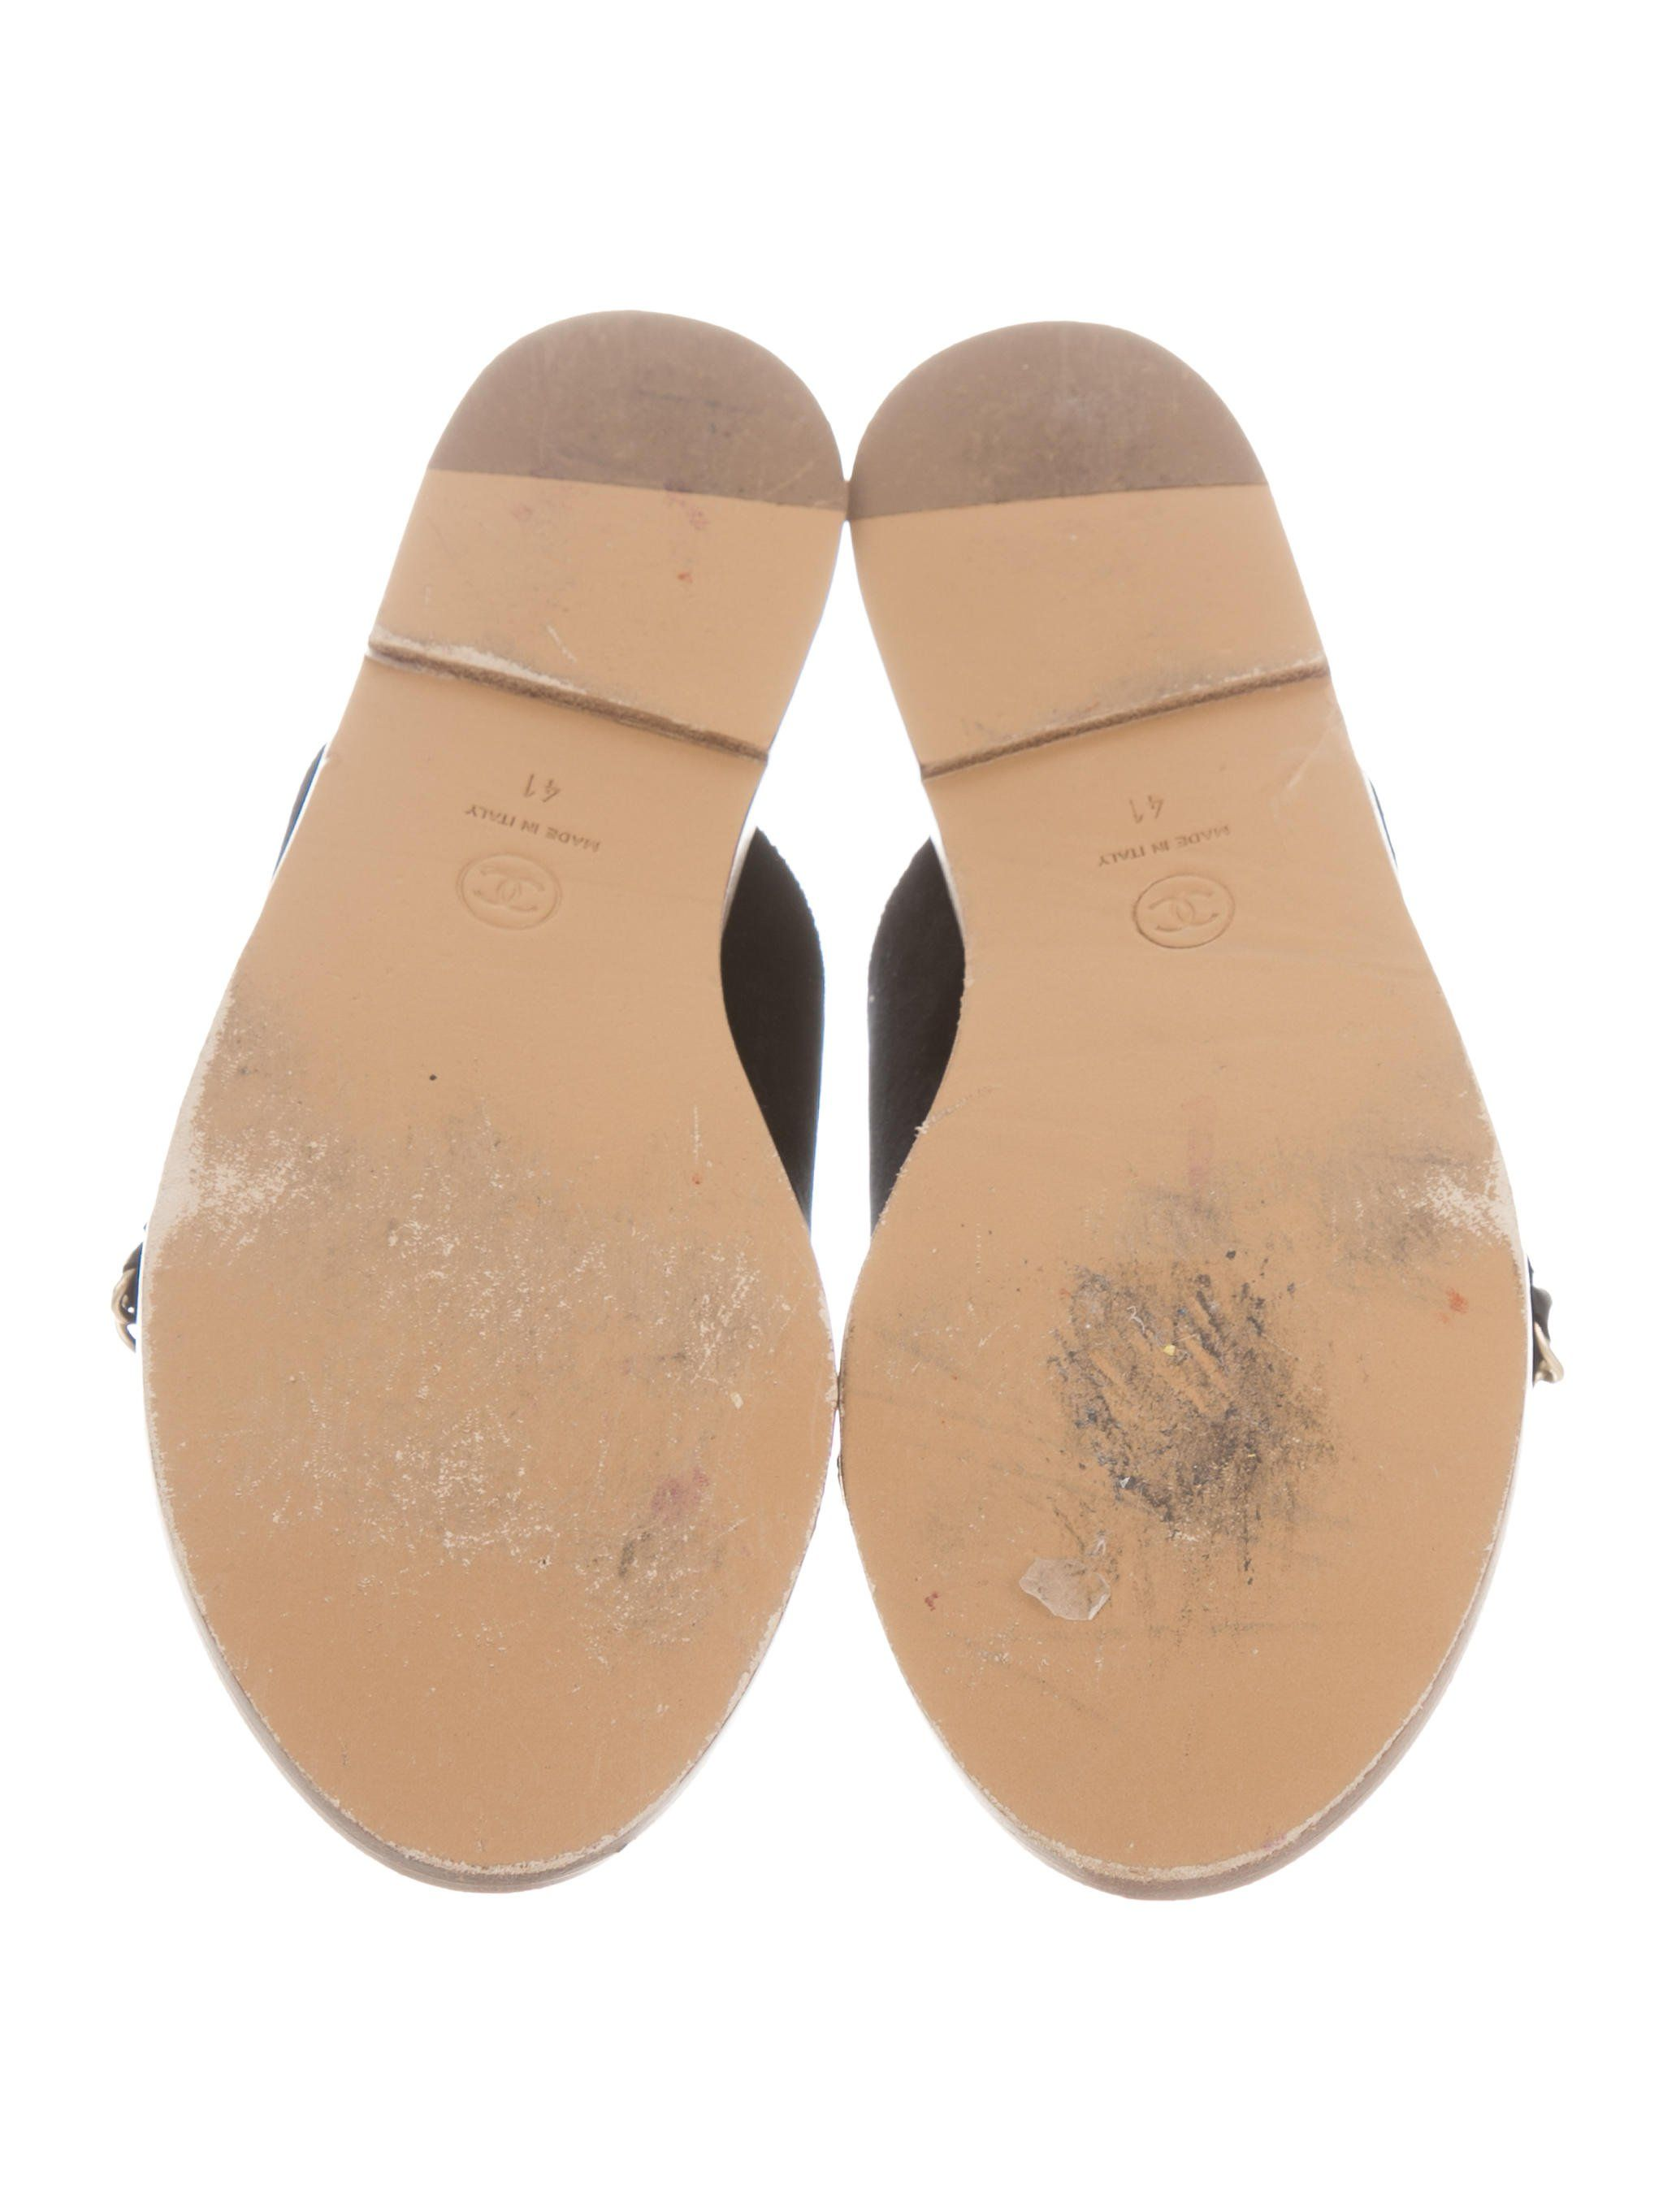 d331d3c8ab62 Black velvet Chanel slide sandals with gold-tone interlocking